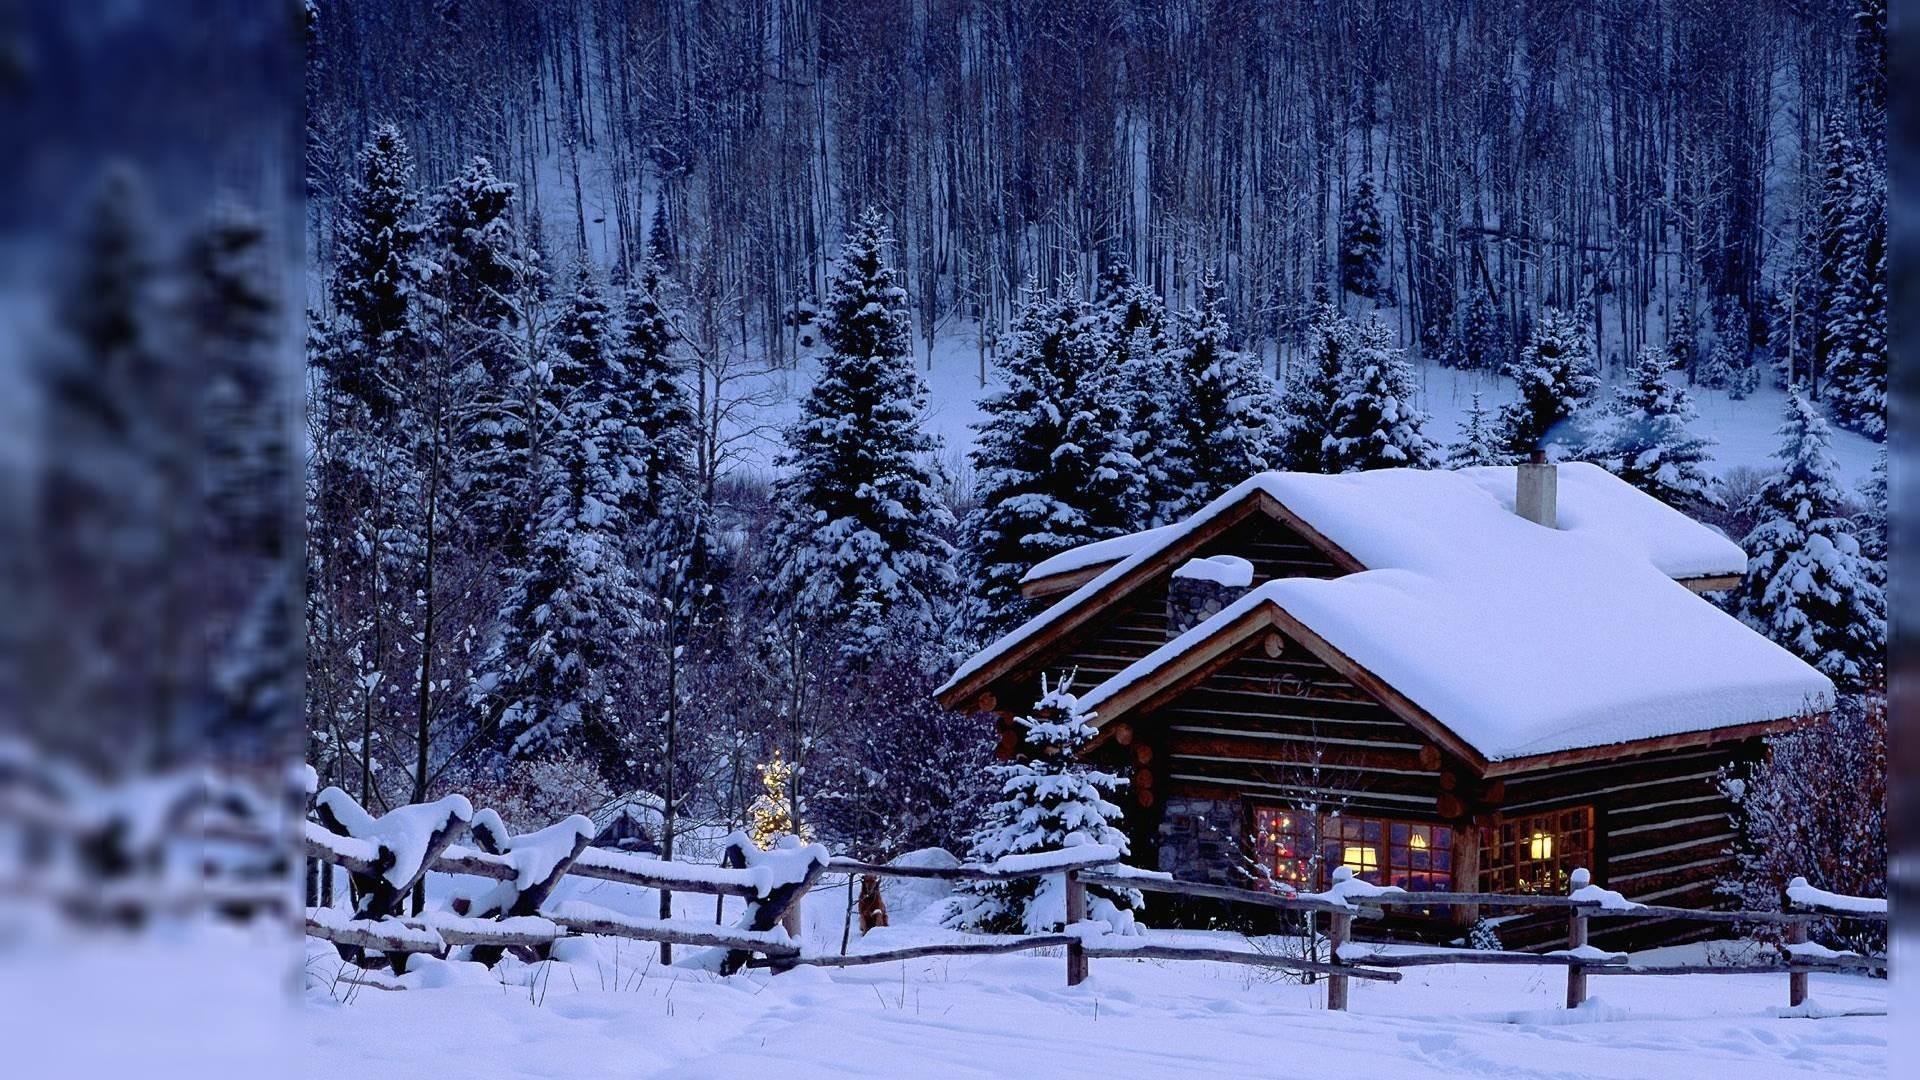 Wallpapers For > Night Winter Wallpaper For Desktop